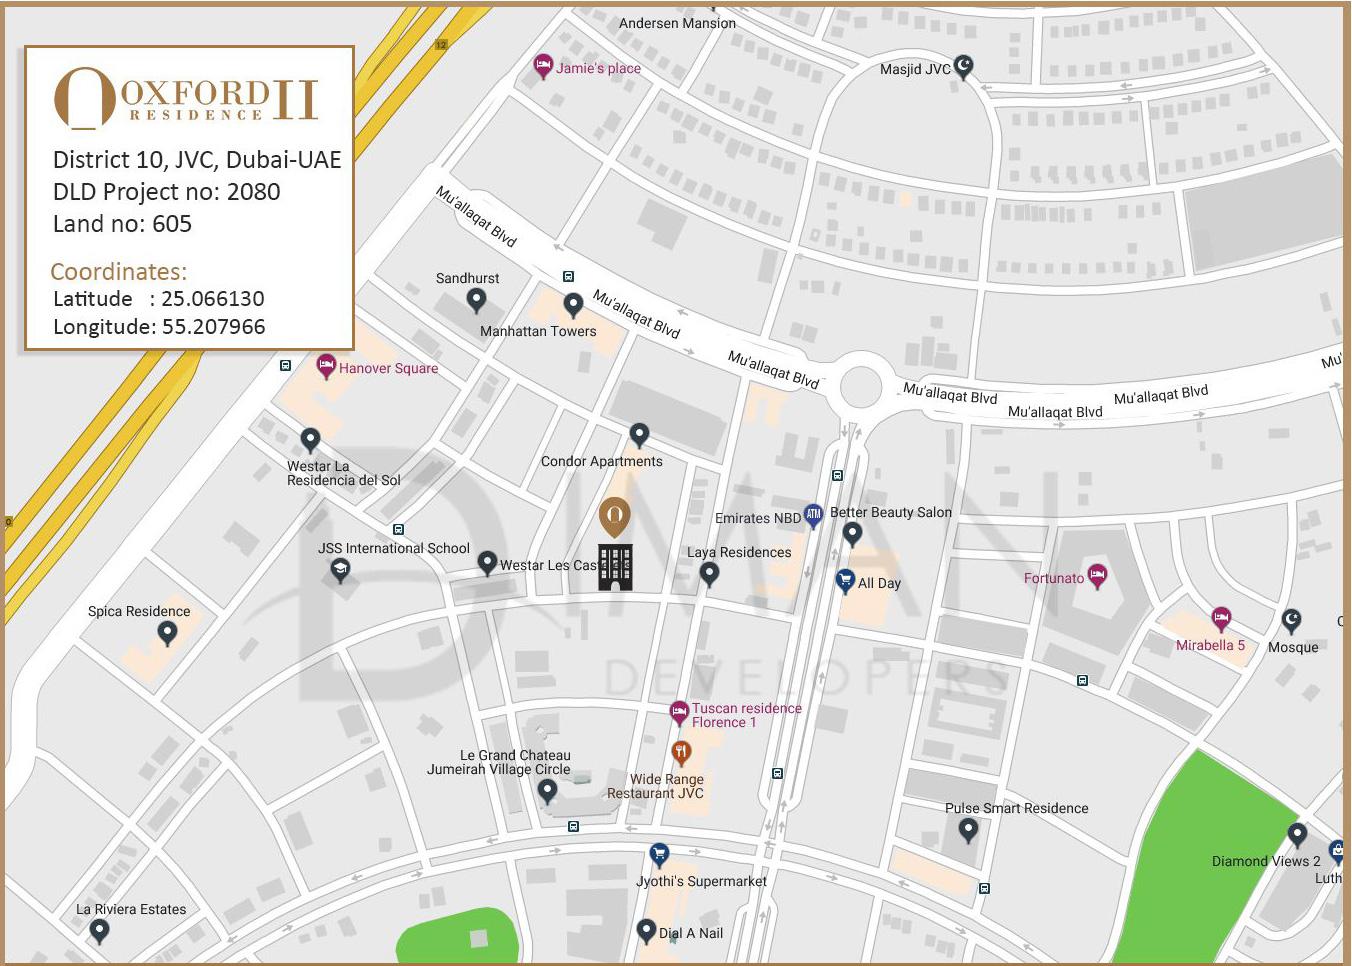 Oxford Residence 2 -  Location Plan